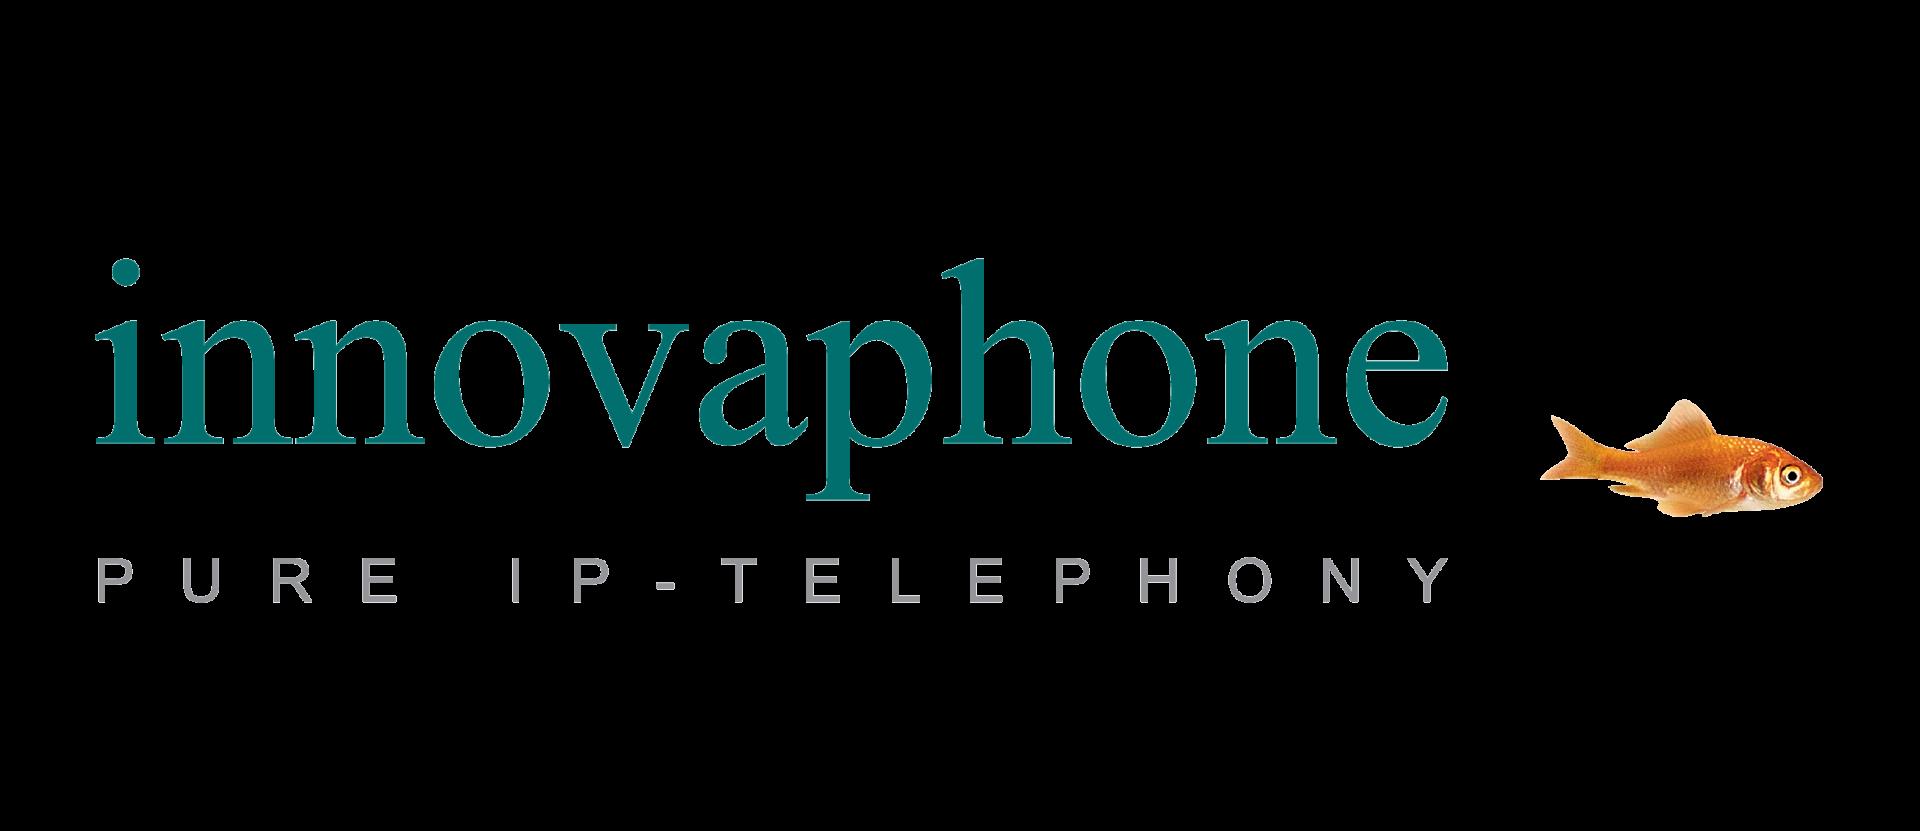 innovaphone evid